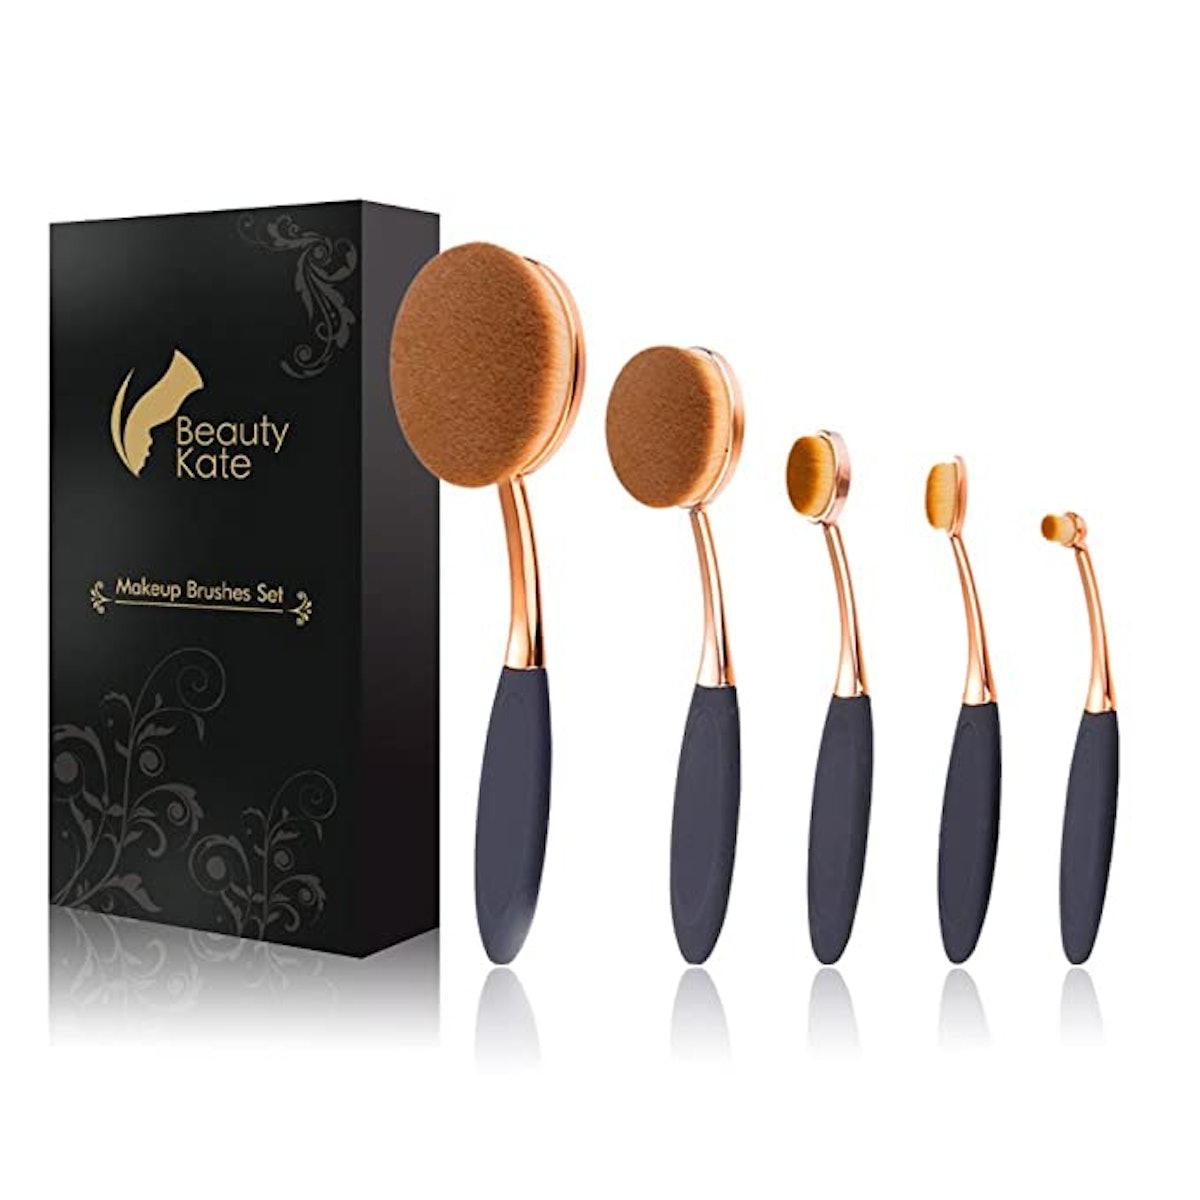 Beauty Kate Oval Makeup Brushes Set (5-Piece)